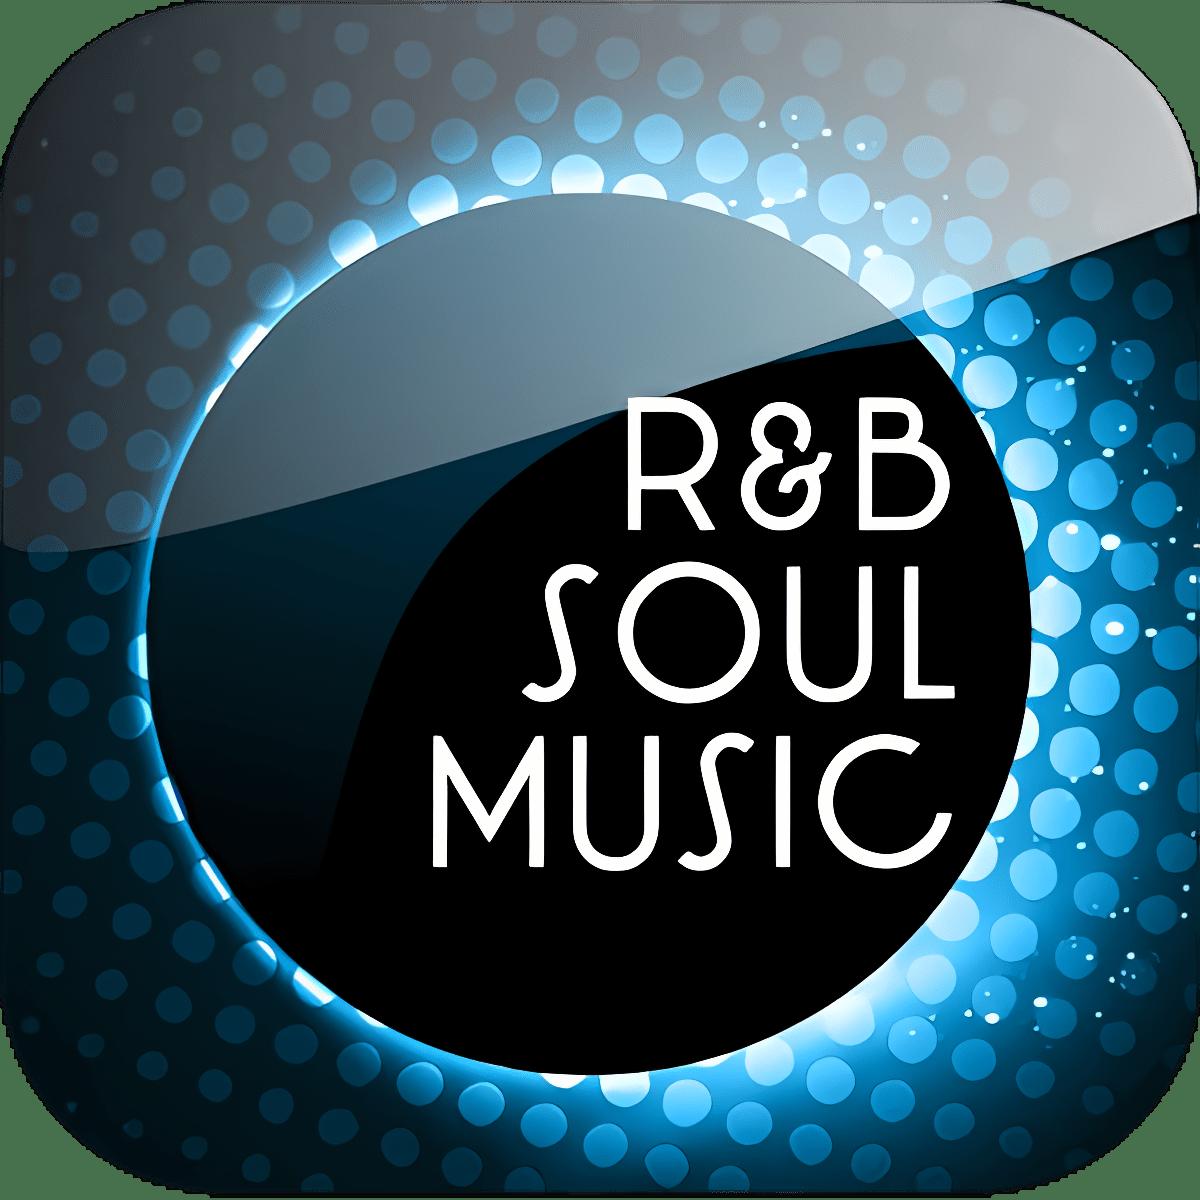 R&B Soul Music